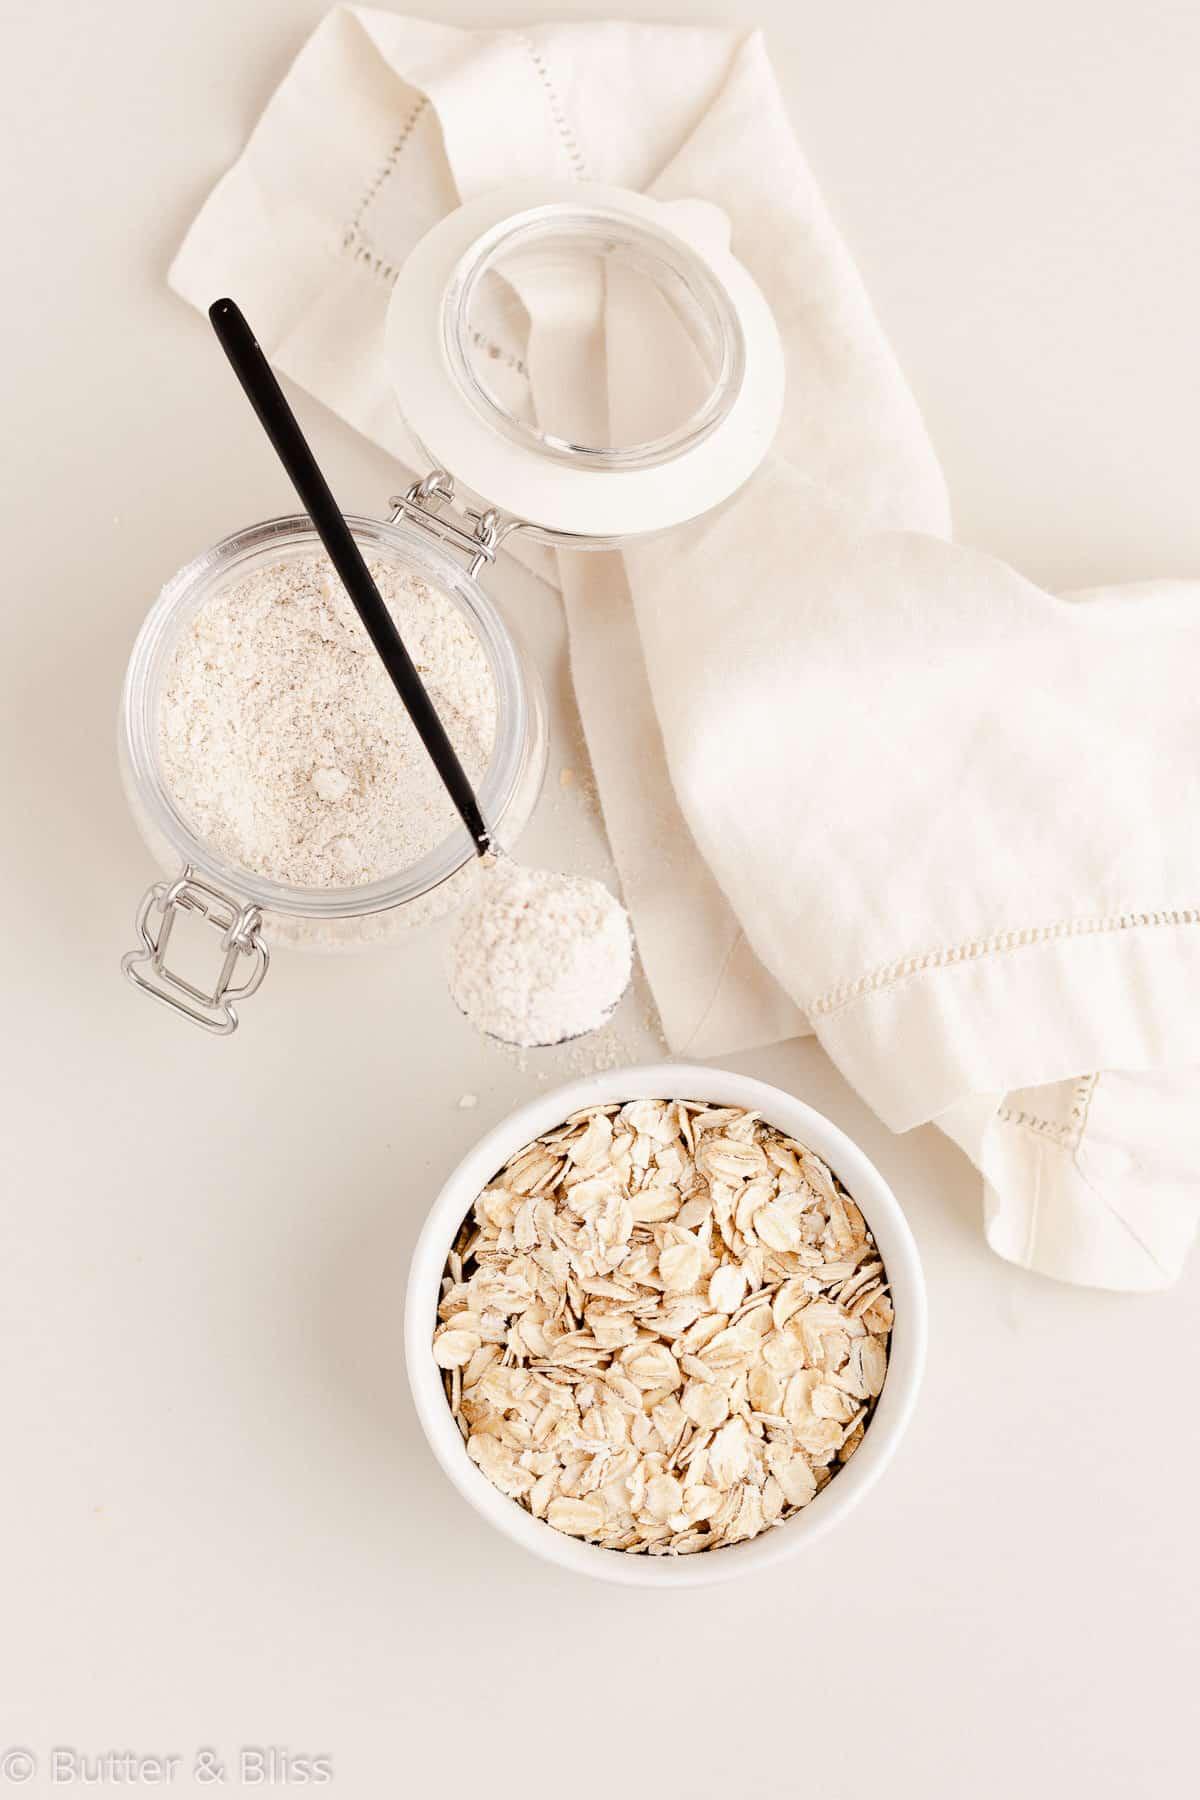 Gluten free oat flour for macadamia nut blondies